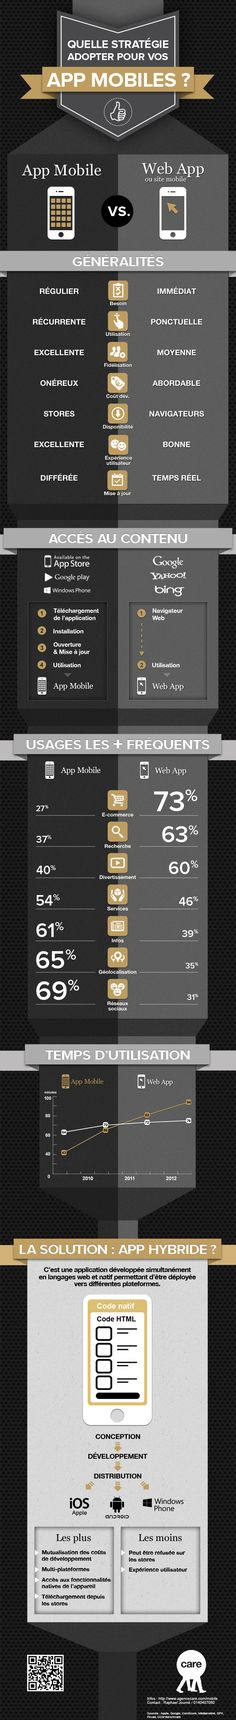 App mobile v/ Web App Marketing Mobile, Marketing Data, Digital Marketing, Web Mobile, Mobile App Design, Web Design, Support Mobile, Interactive Marketing, Applications Mobiles